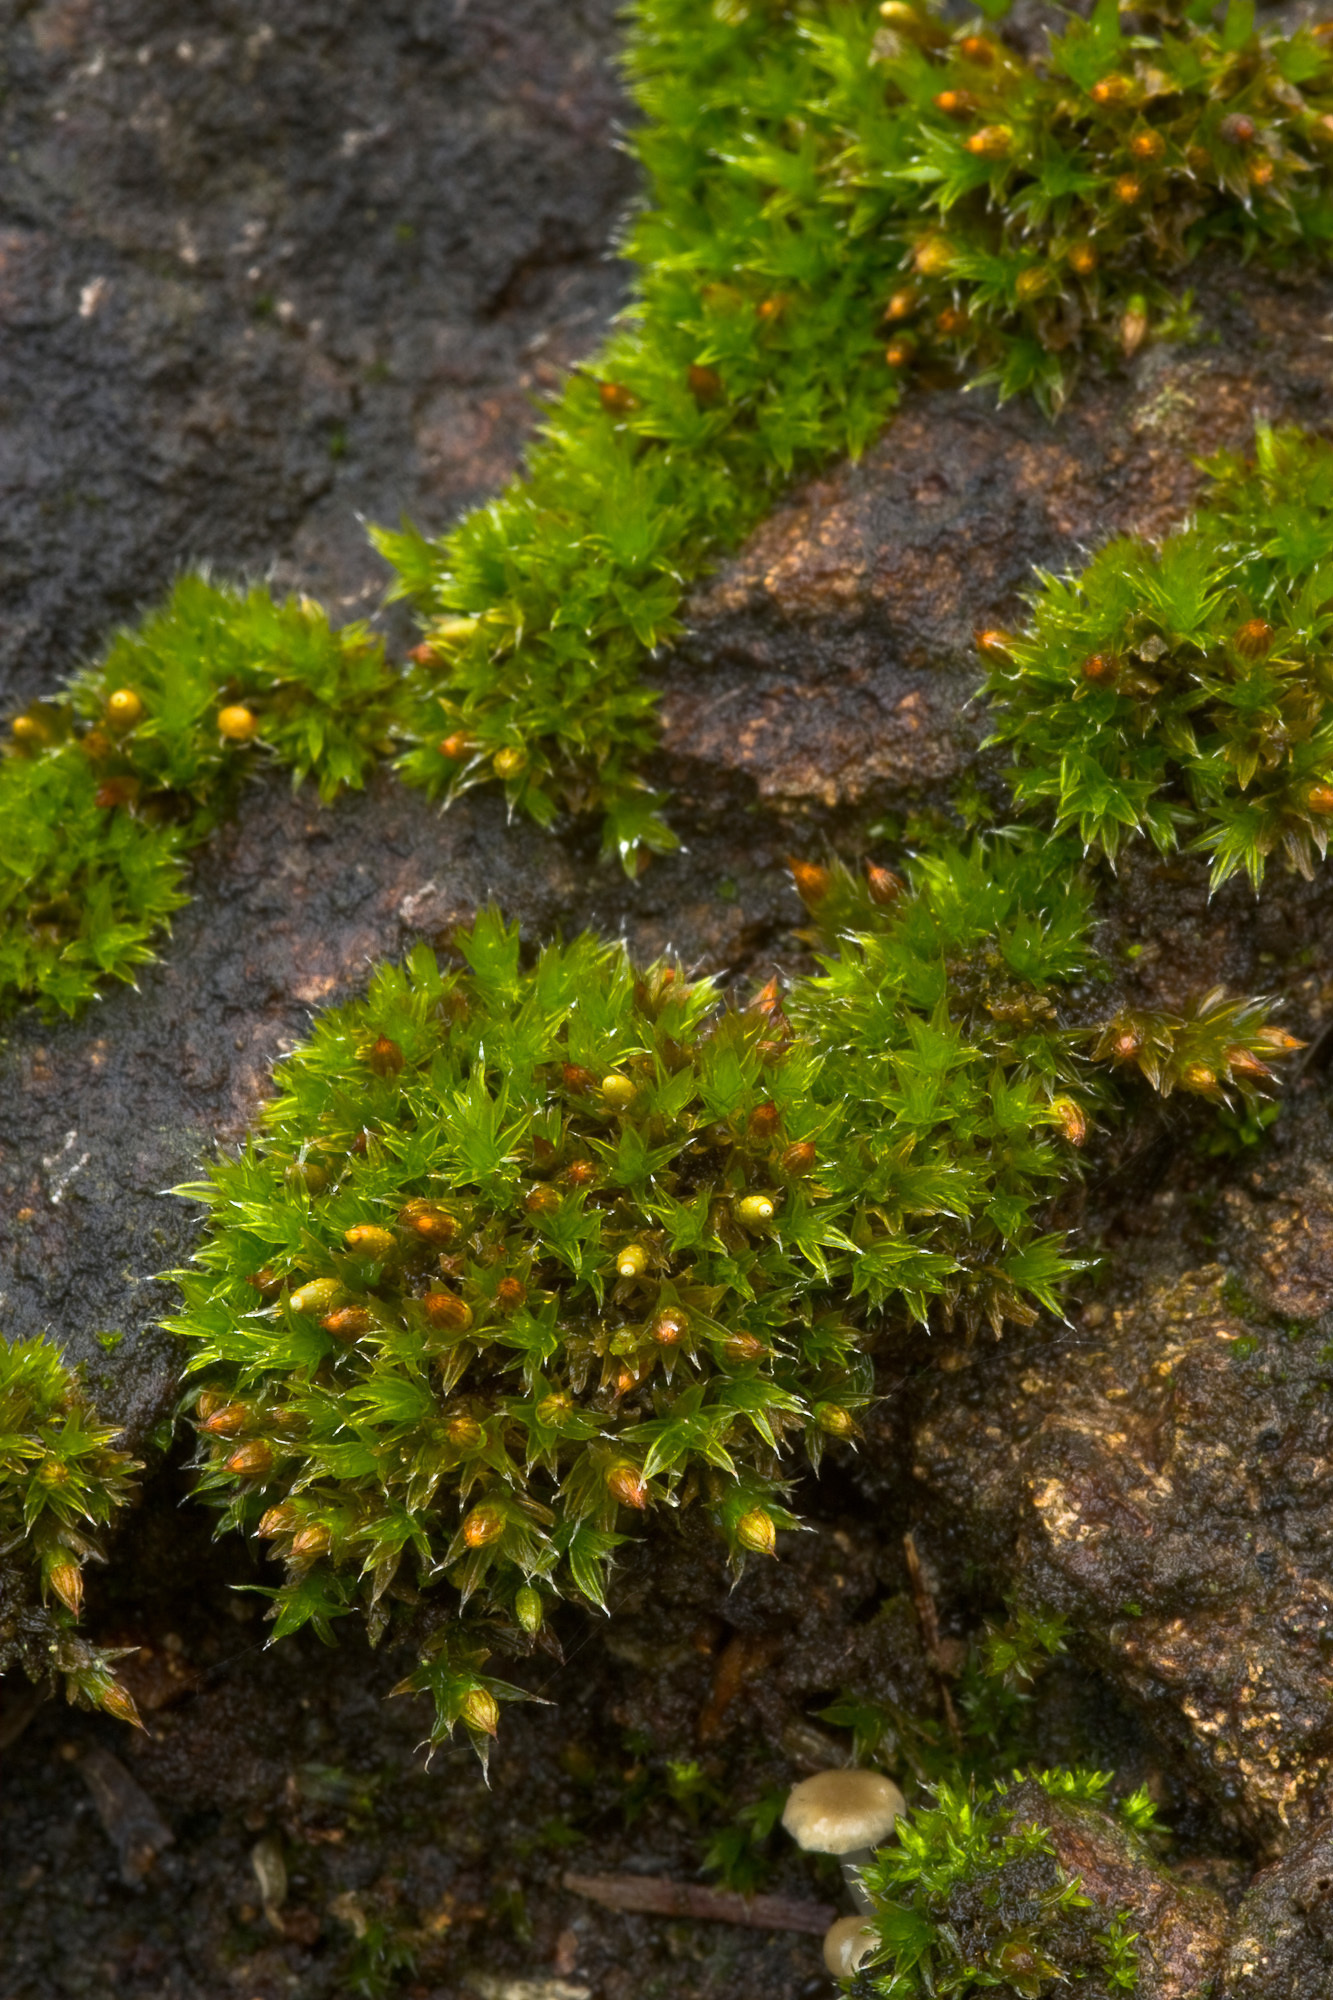 Image of orthotrichum moss